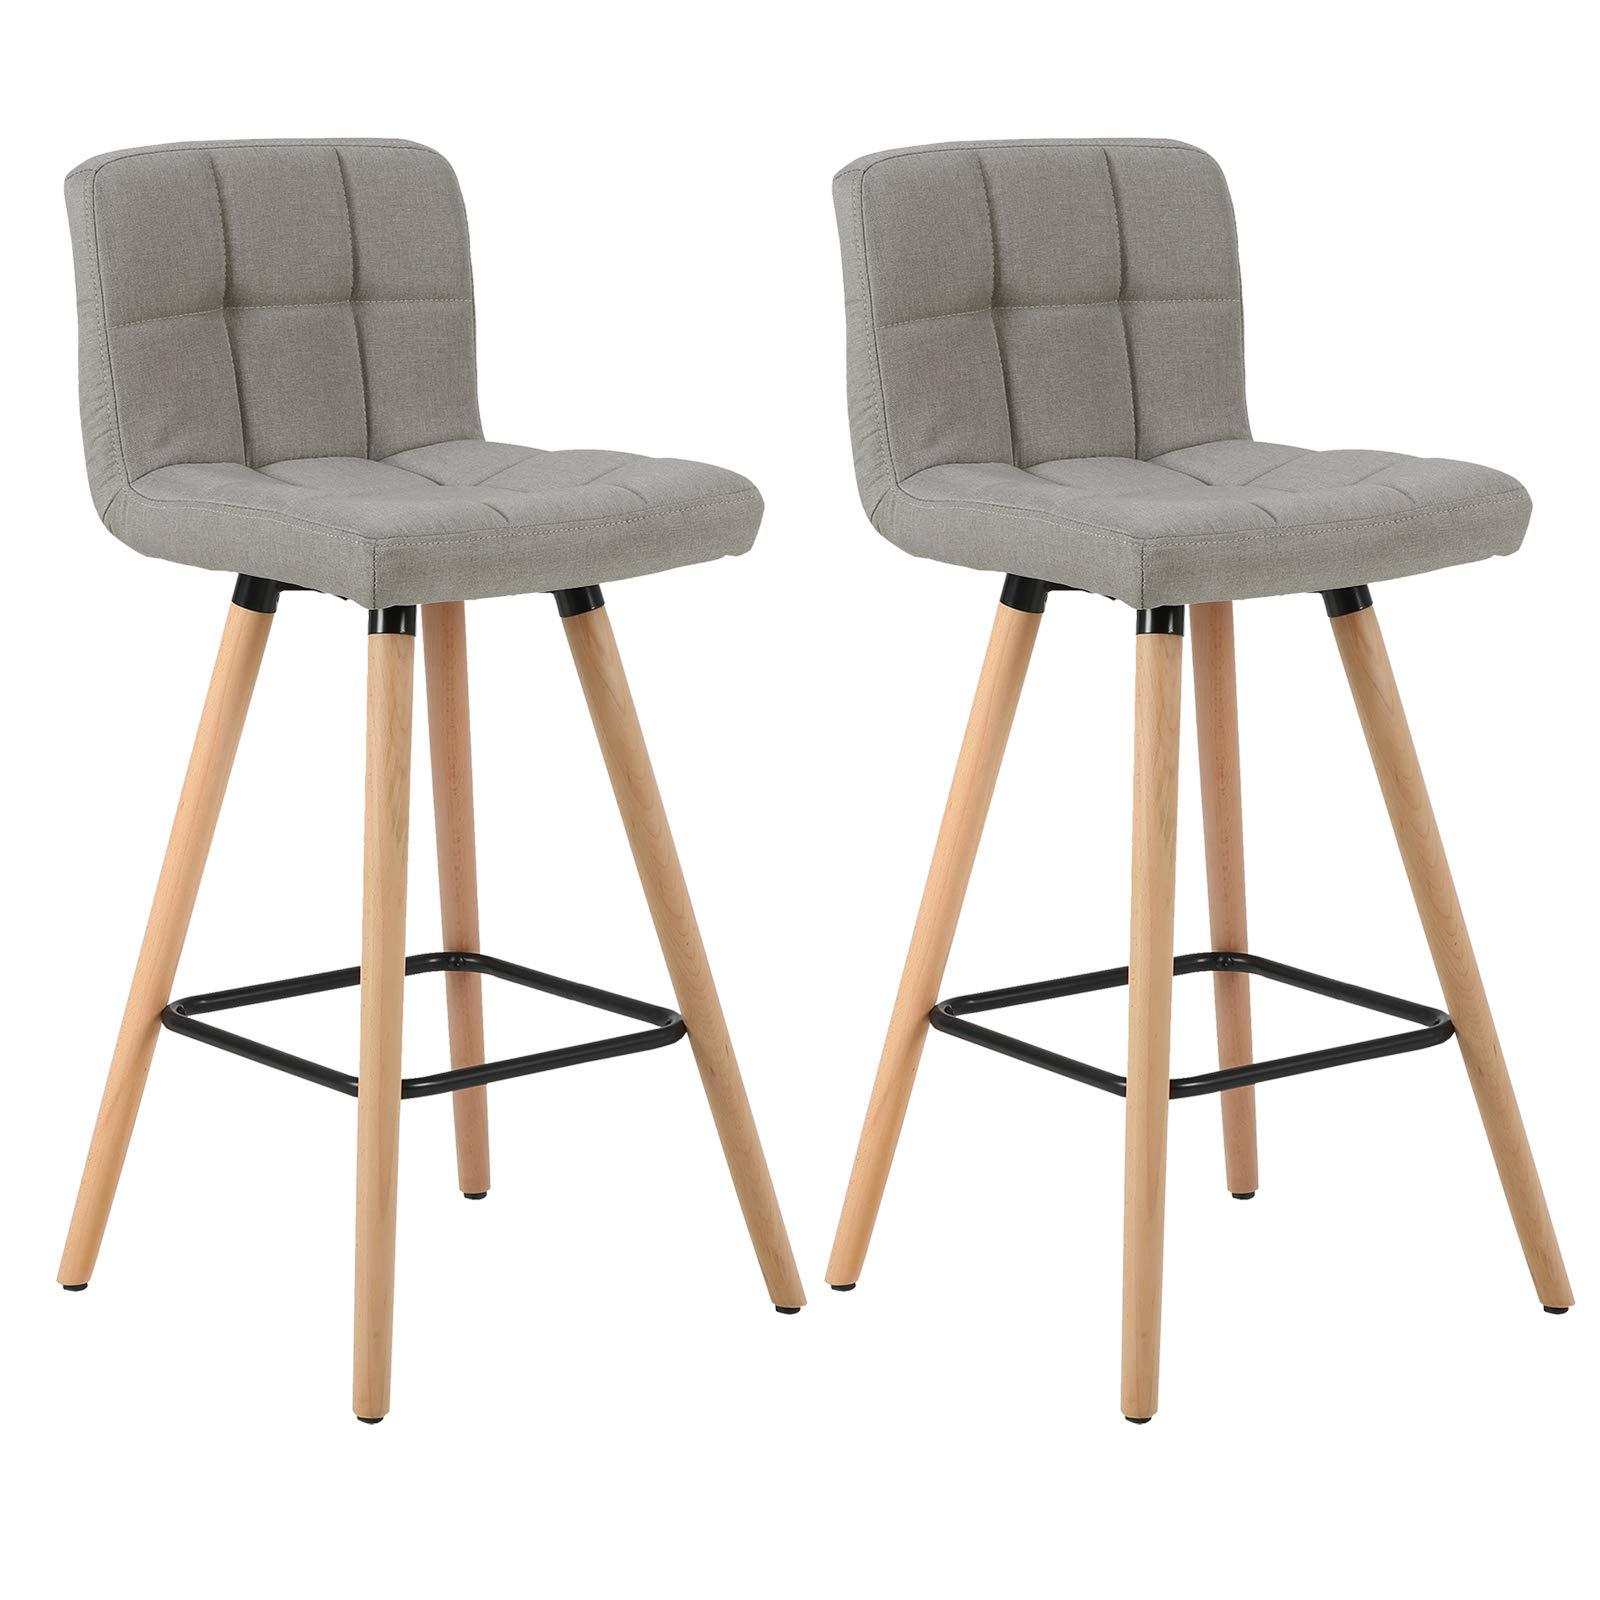 WOLTU Bar Stools Set of 9 PCS Soft Linen Seat Bar Chairs Breakfast ...